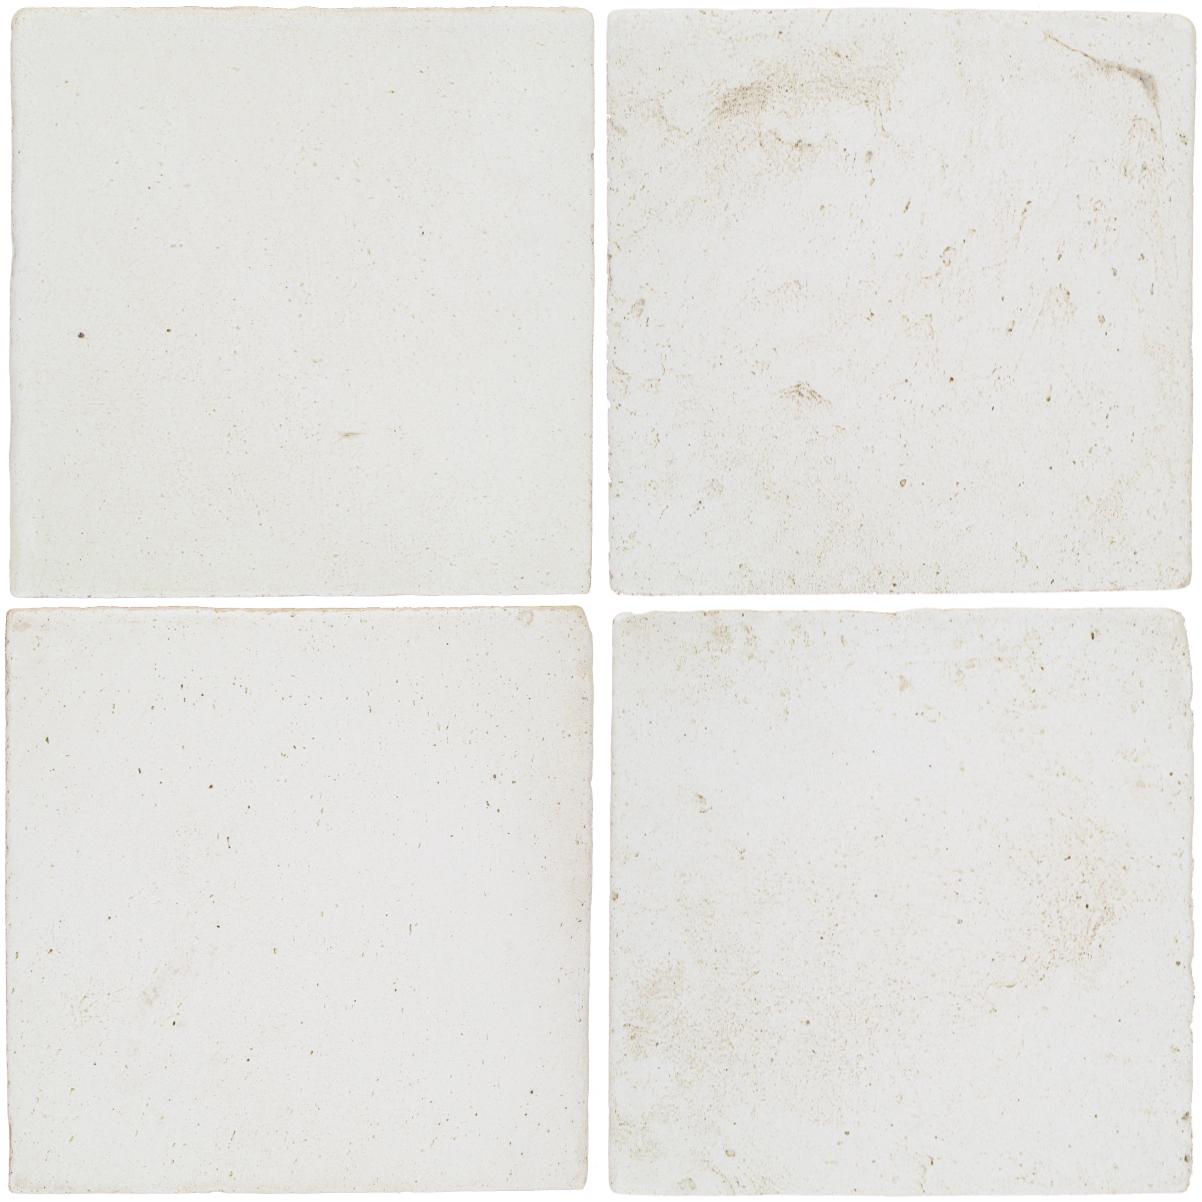 OHS/VTG-PGFW (Floral White)